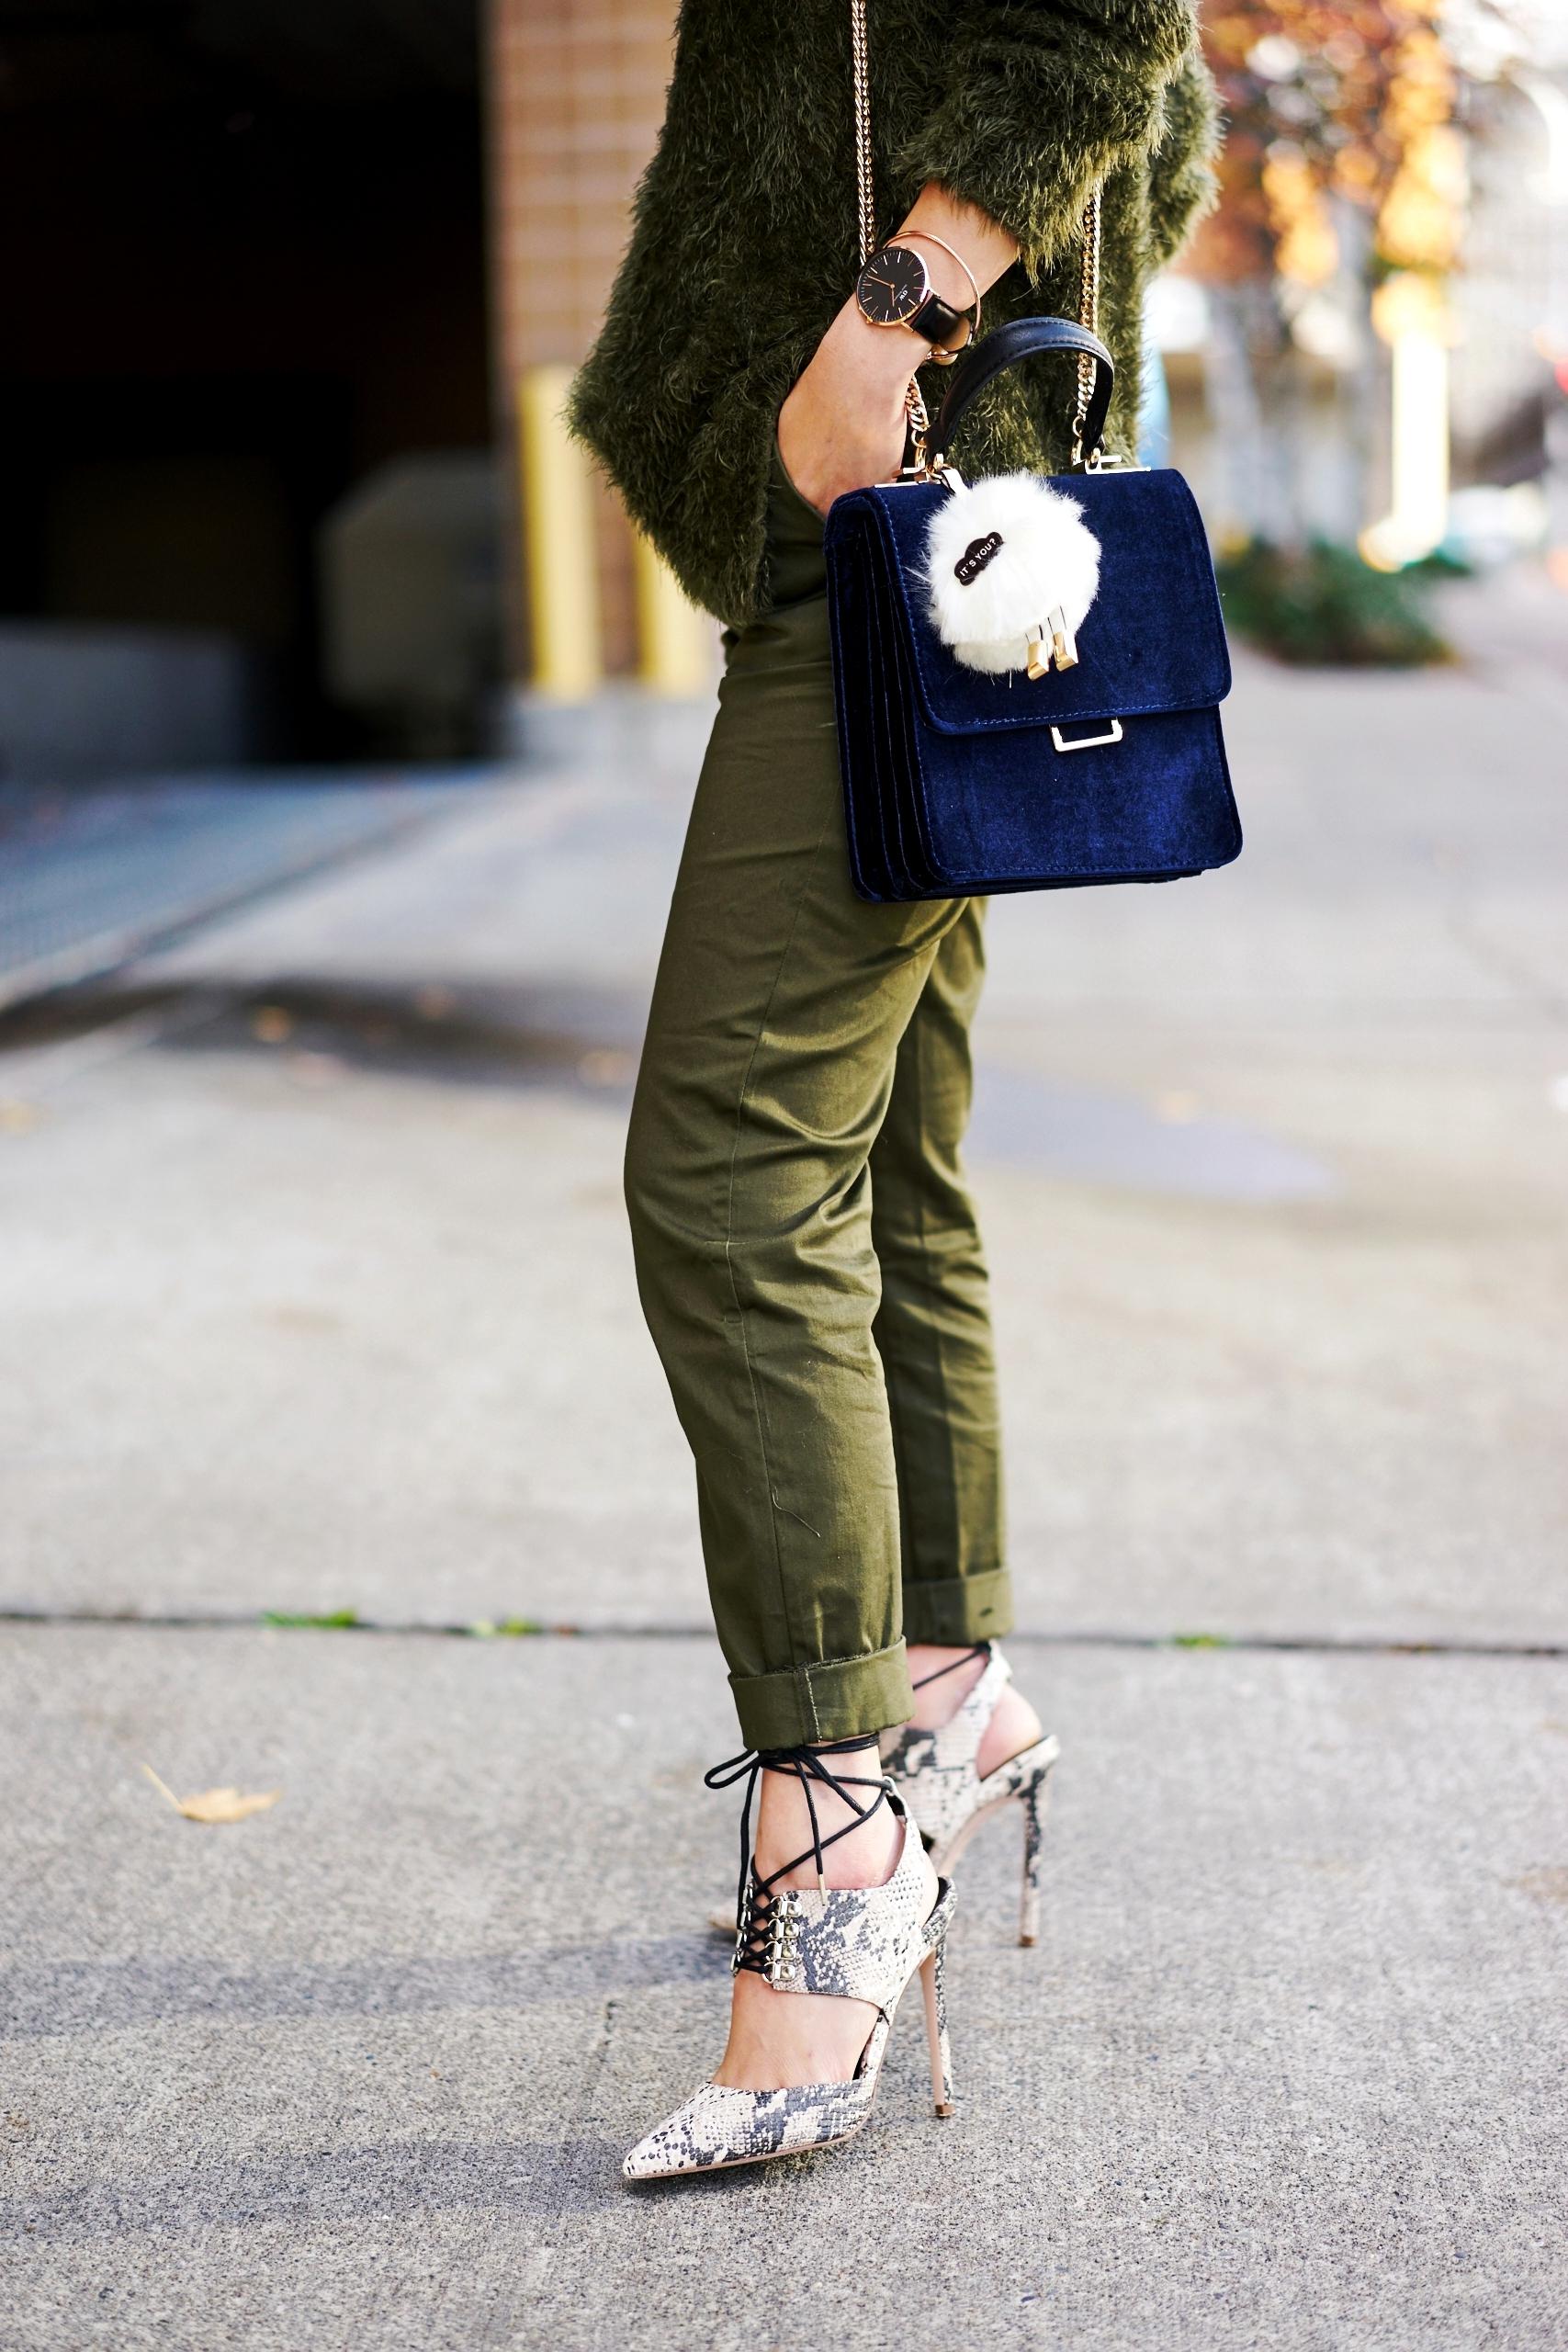 H&M cropped trousers-ASOS python lace-up pumps-ZARA navy velvet bag-mango earrings-Daniel Wellington Watch-Clear Lens aviator-Aika's Love Closet-Seattle Style blogger-japanese-pink hair-colored hair